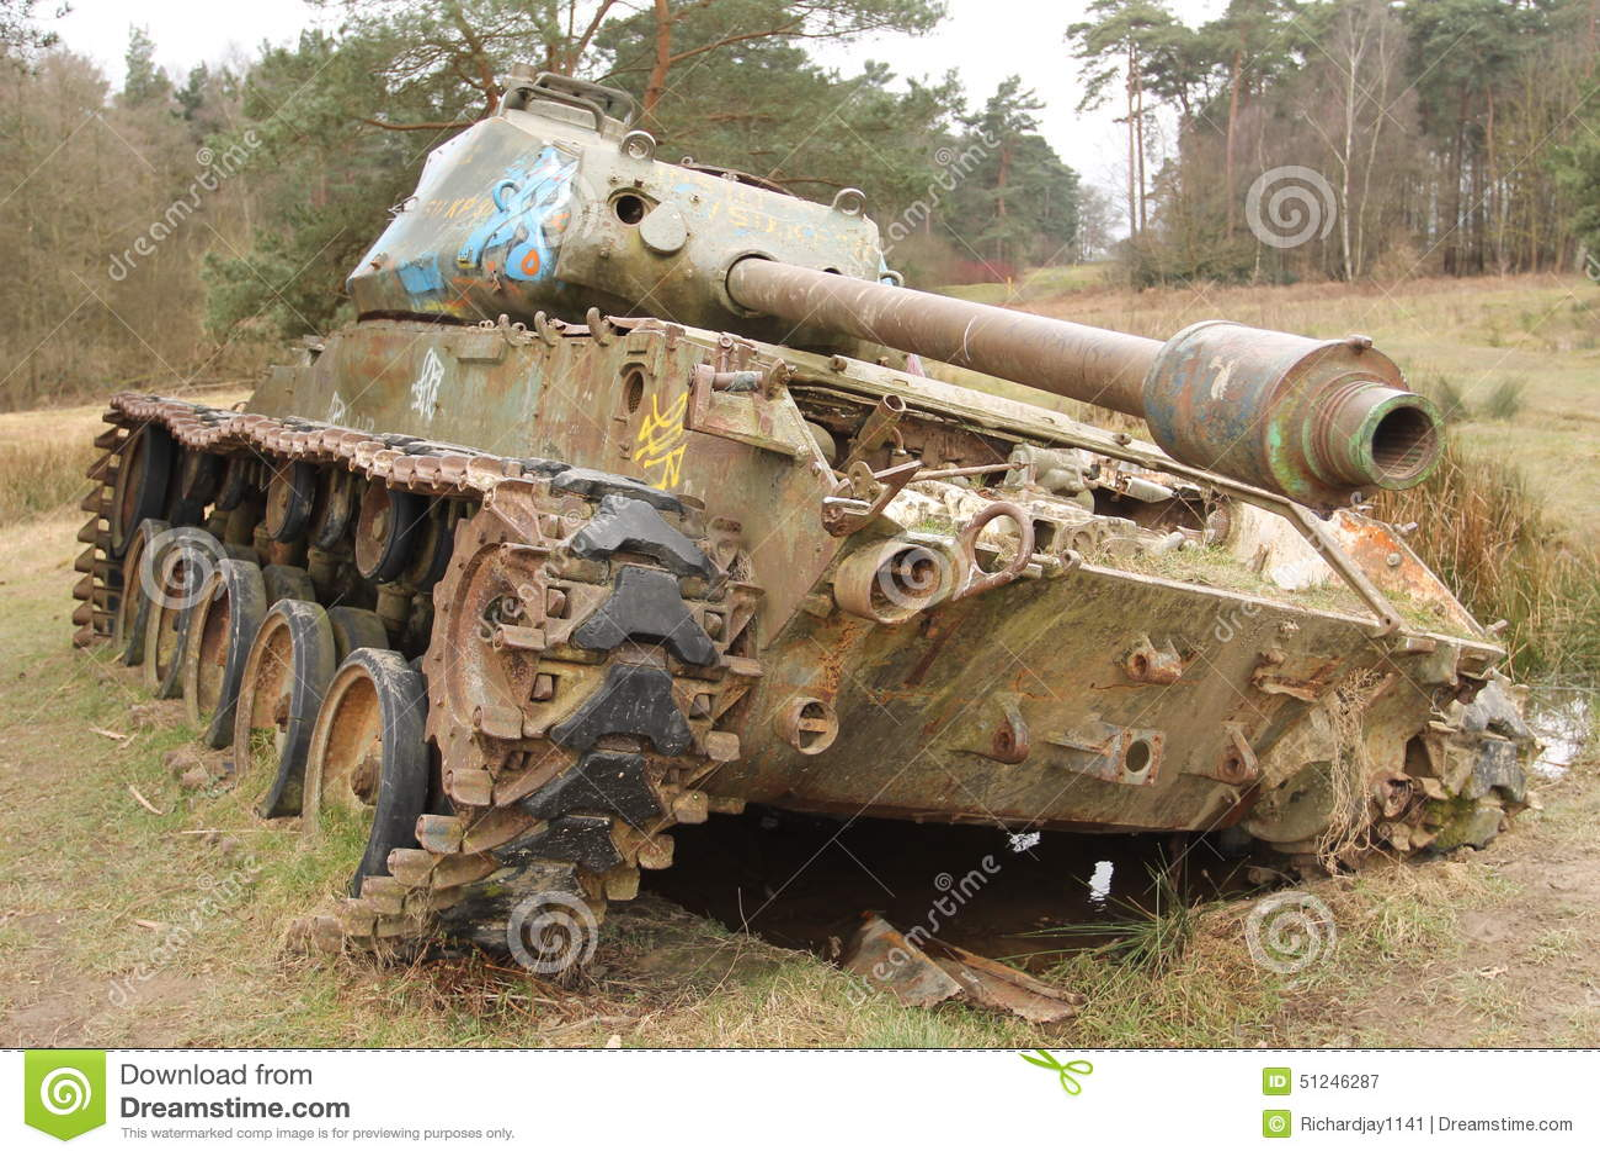 Vintage Military Equipment 4